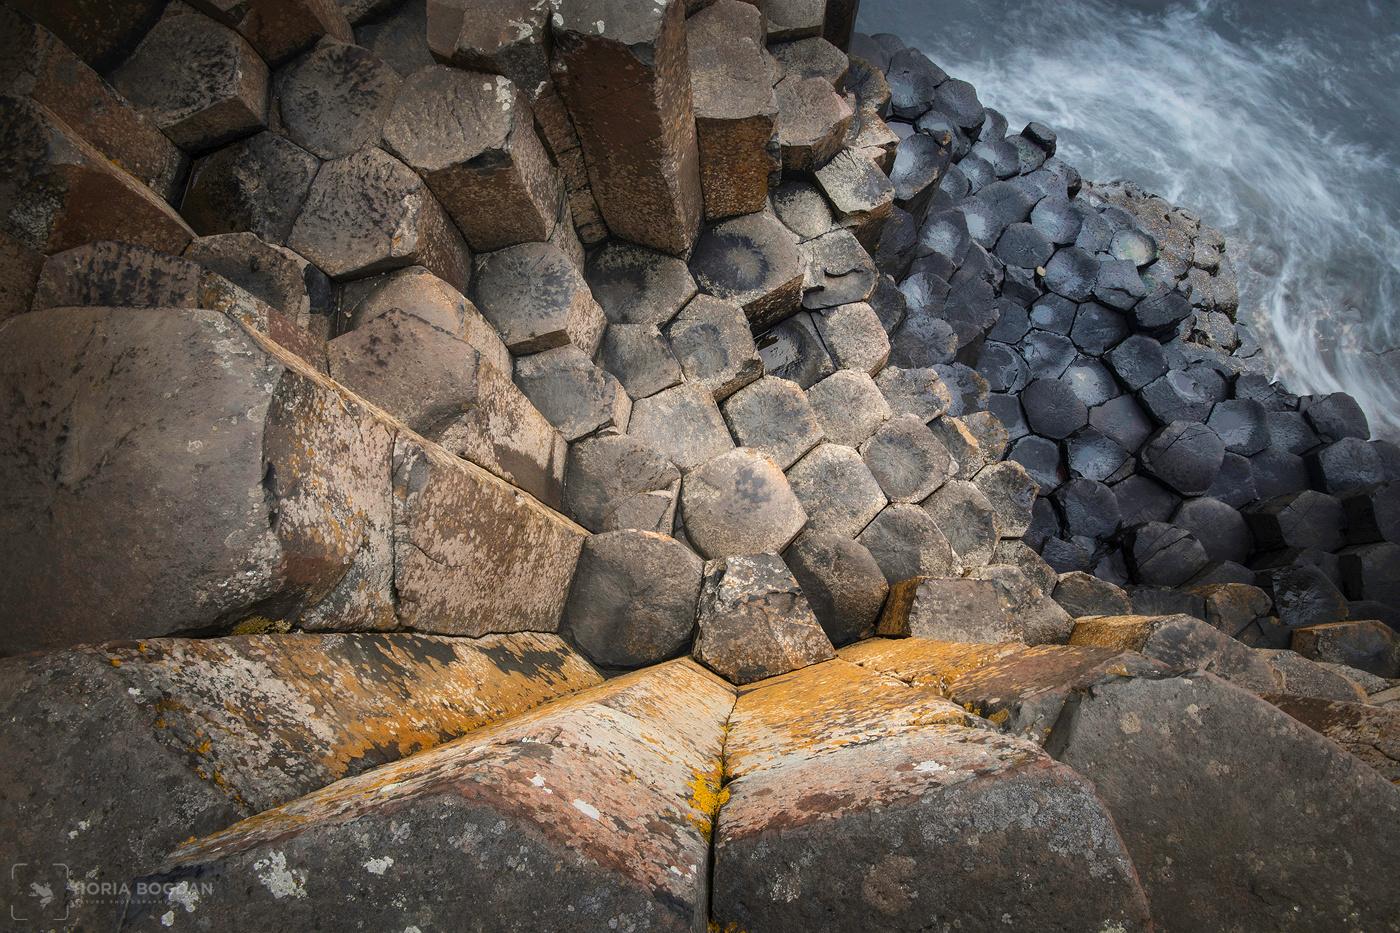 3D rock geometry by Horia Bogdan